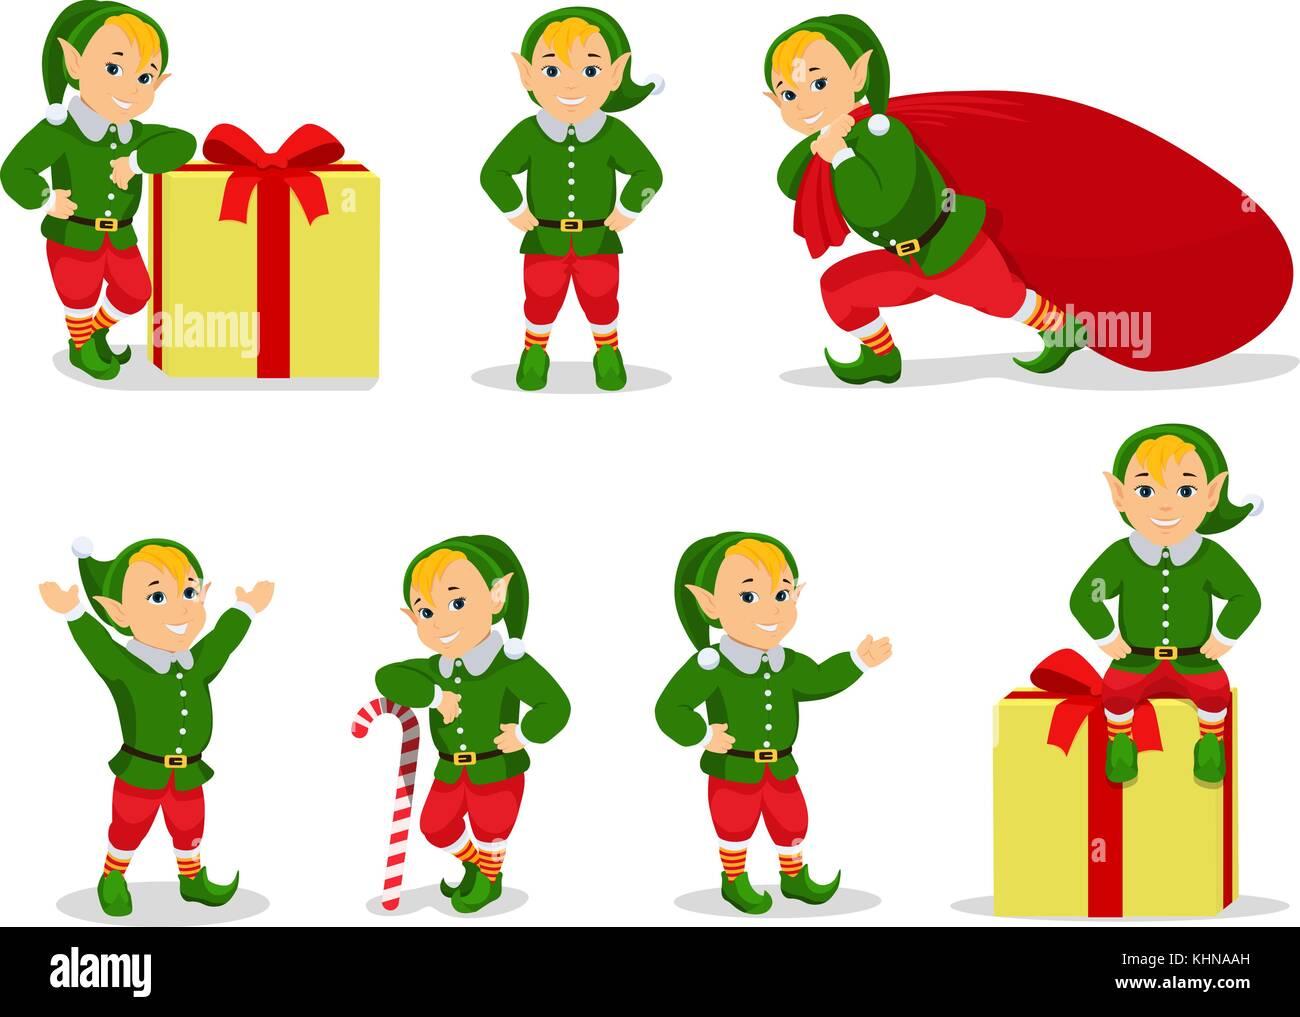 vector illustration set of cartoon christmas elves stock image - Merry Christmas Elf